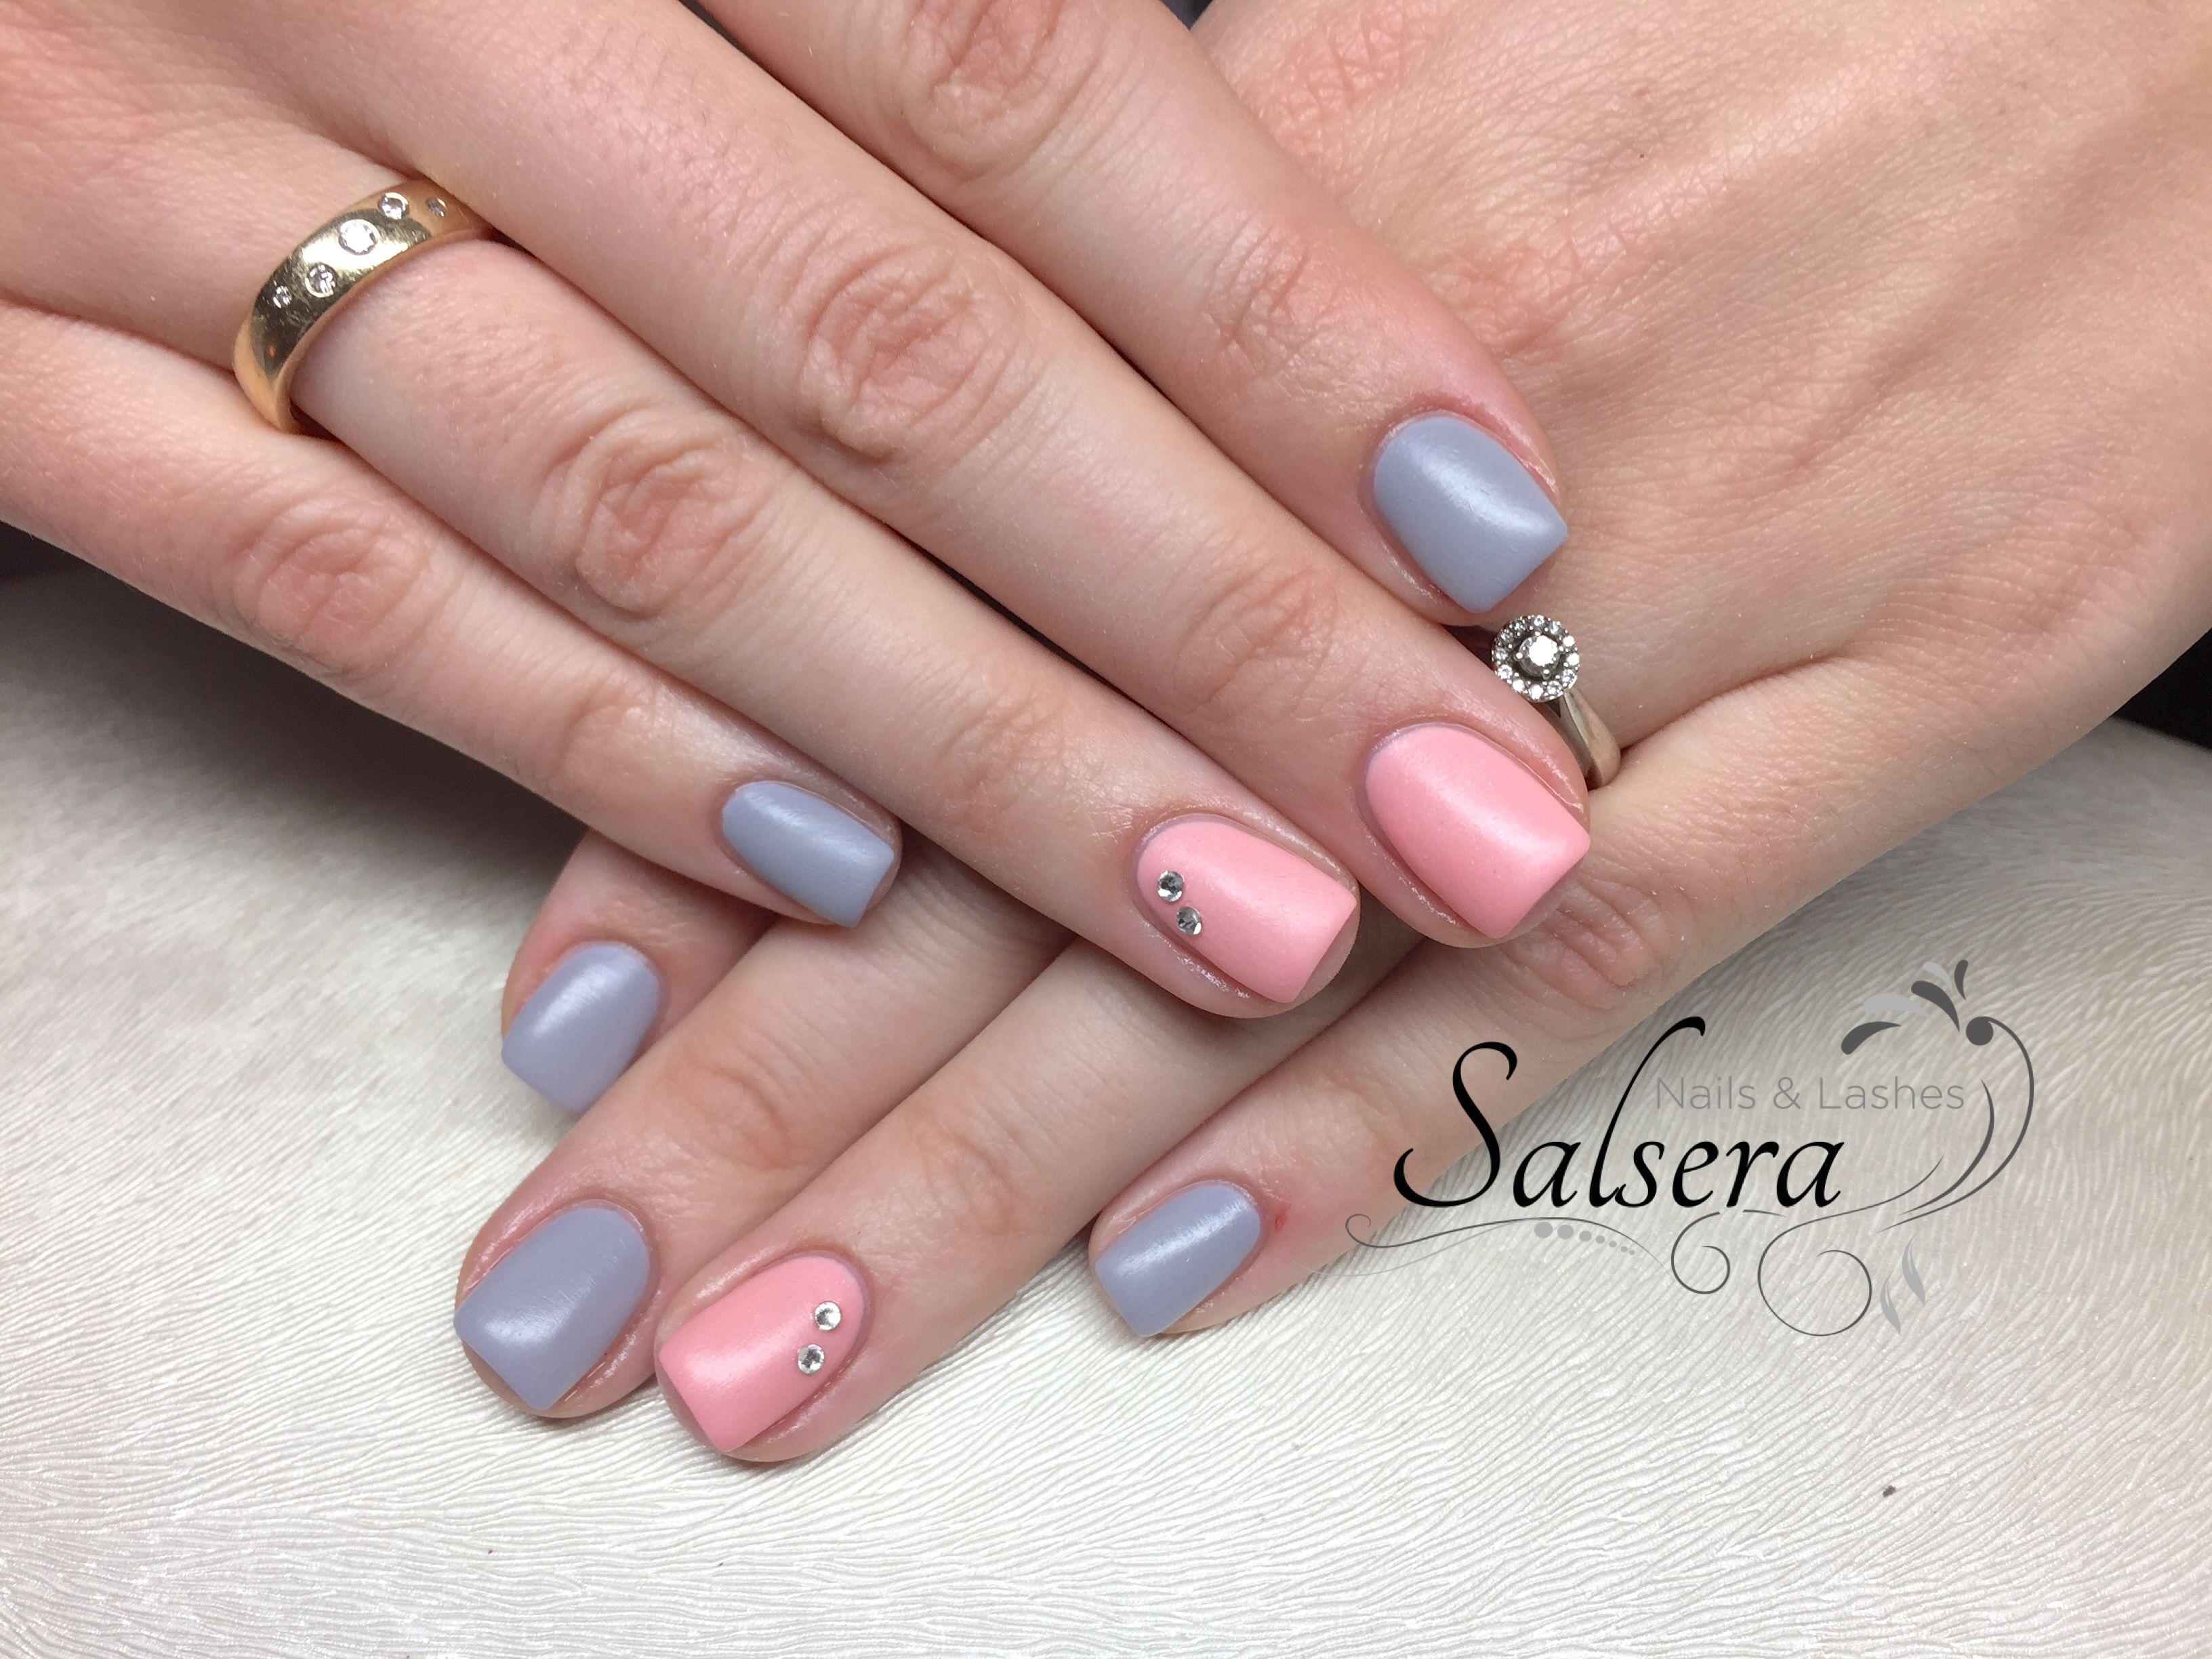 Nails Nägel Nageldesign Naildesign Squarenails Fullcover Rosé grey ...